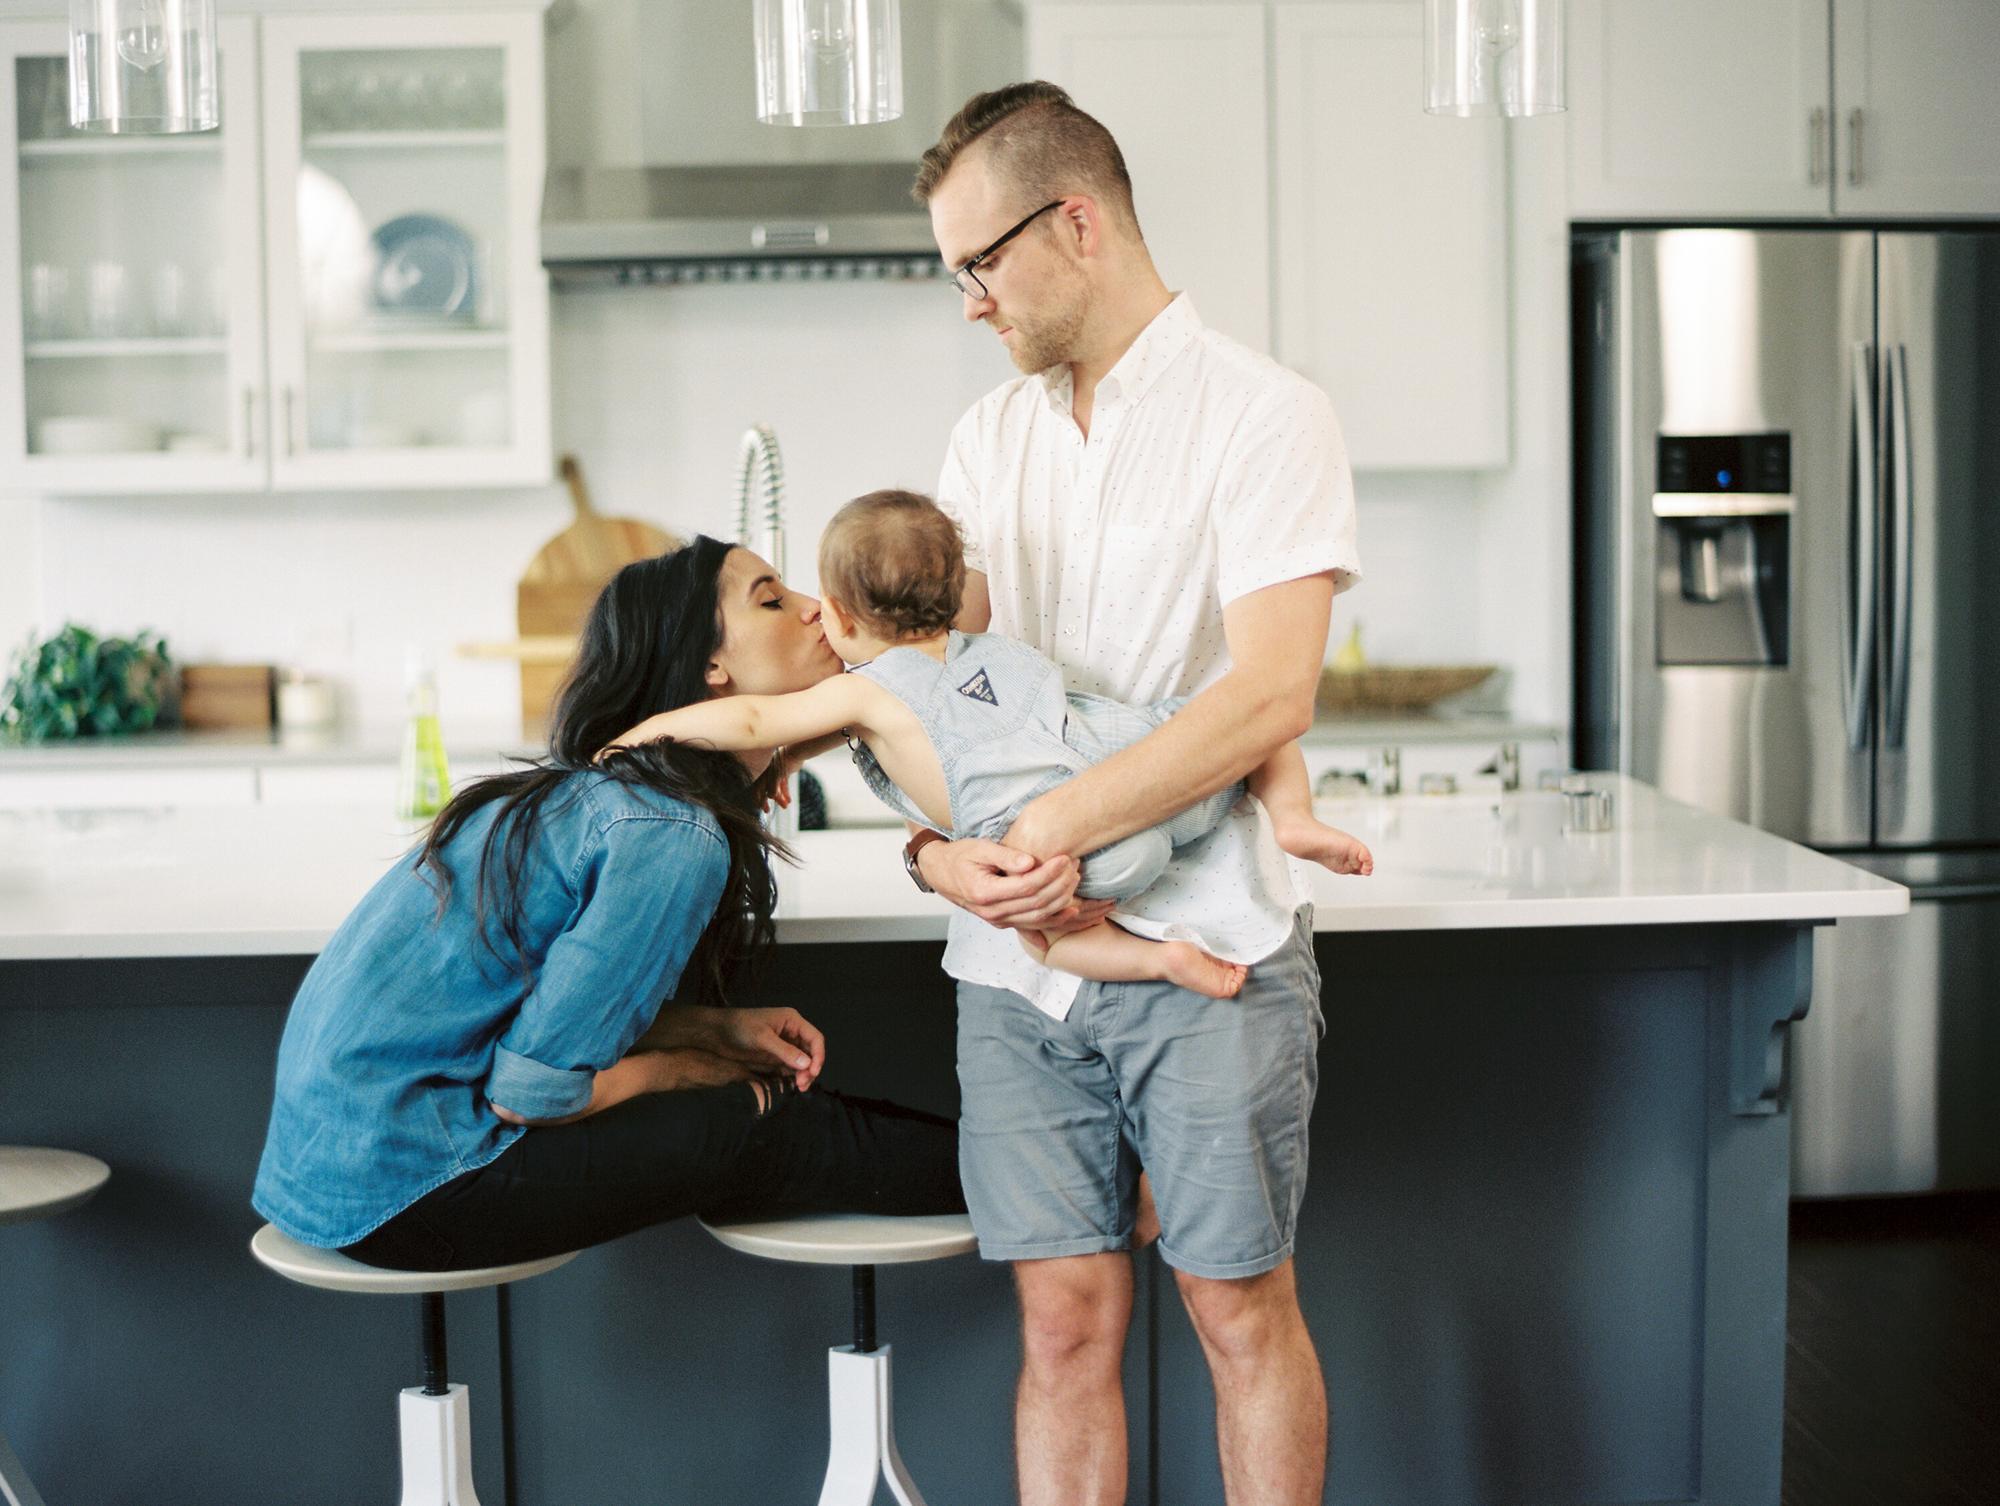 Lynchburg_DC_family_wedding_film_photographer_white_kitchen_baby_announcement-35.jpg